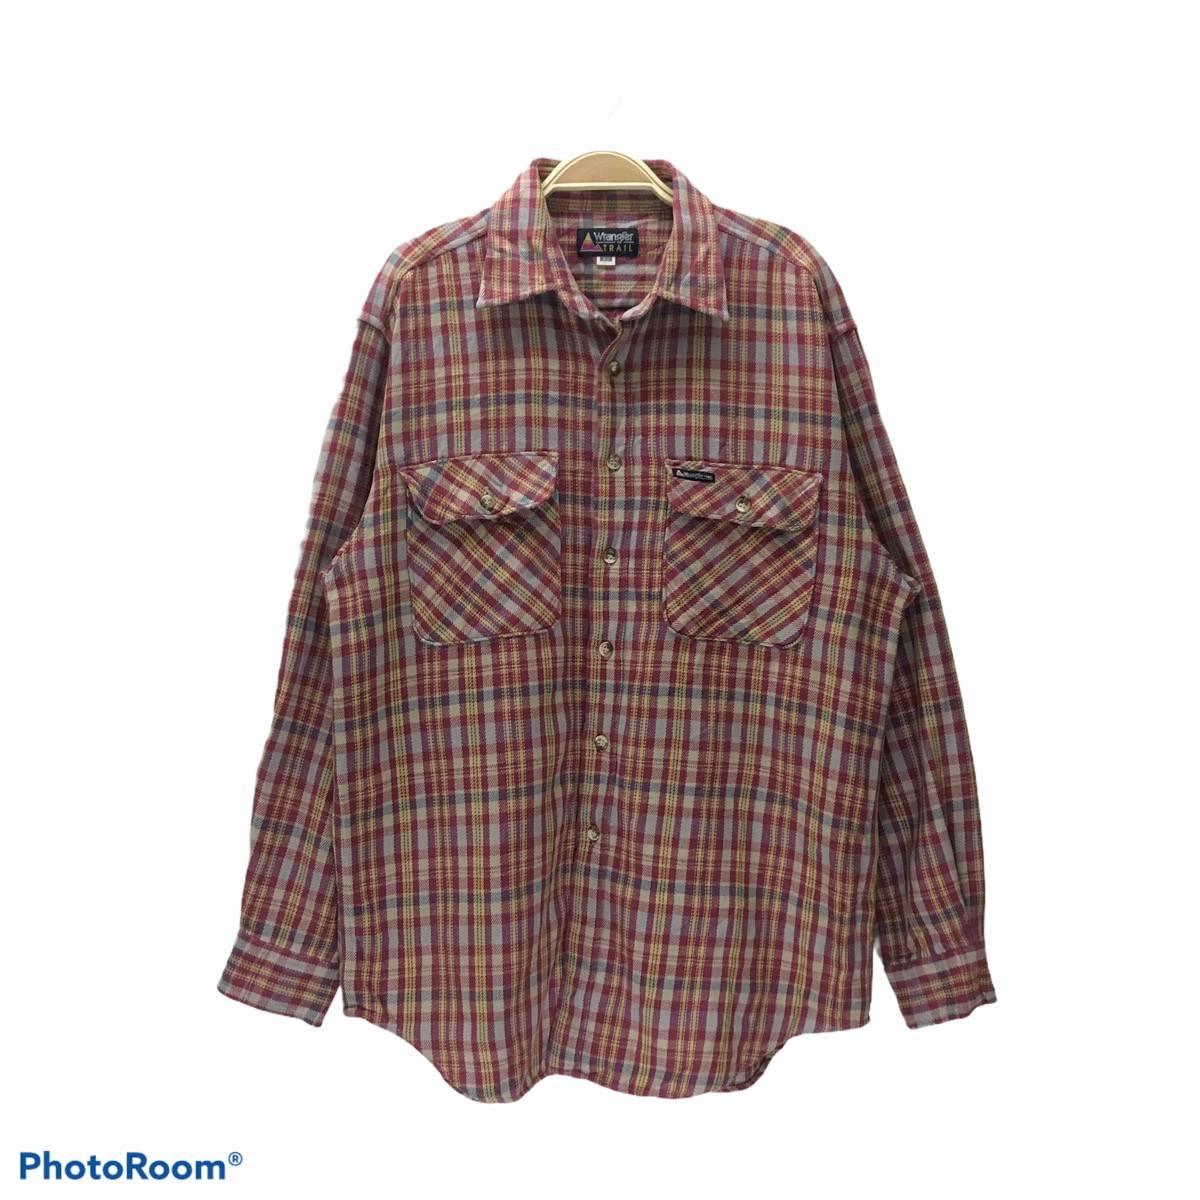 Vintage Wrangler Button up  Maroon Wangler Shirt  Vintage Wangler  Wrangler